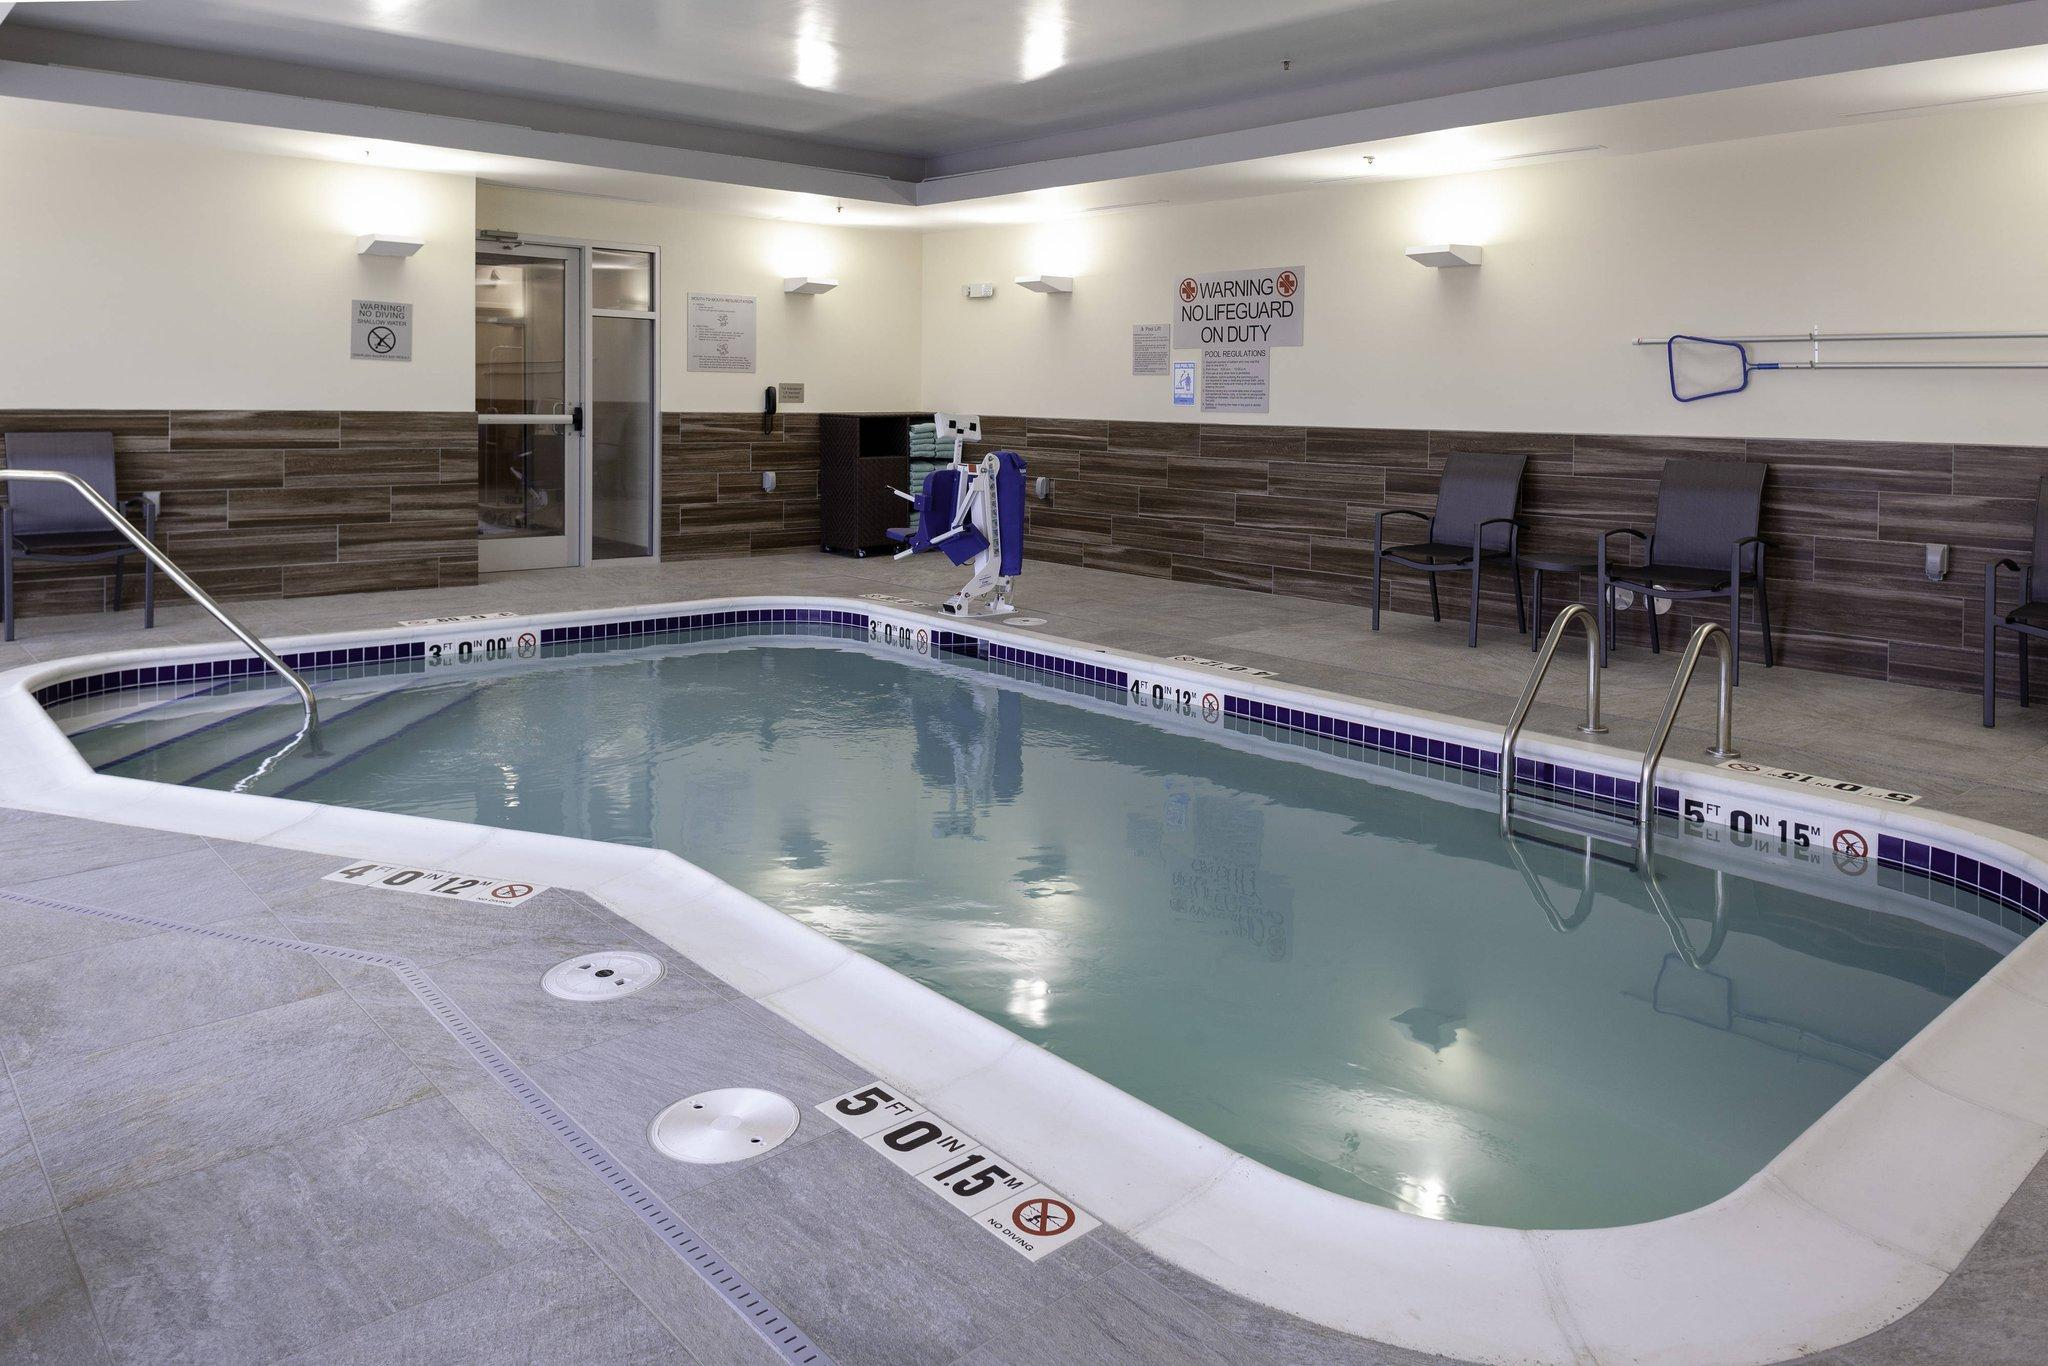 Fairfield Inn & Suites Fort Morgan